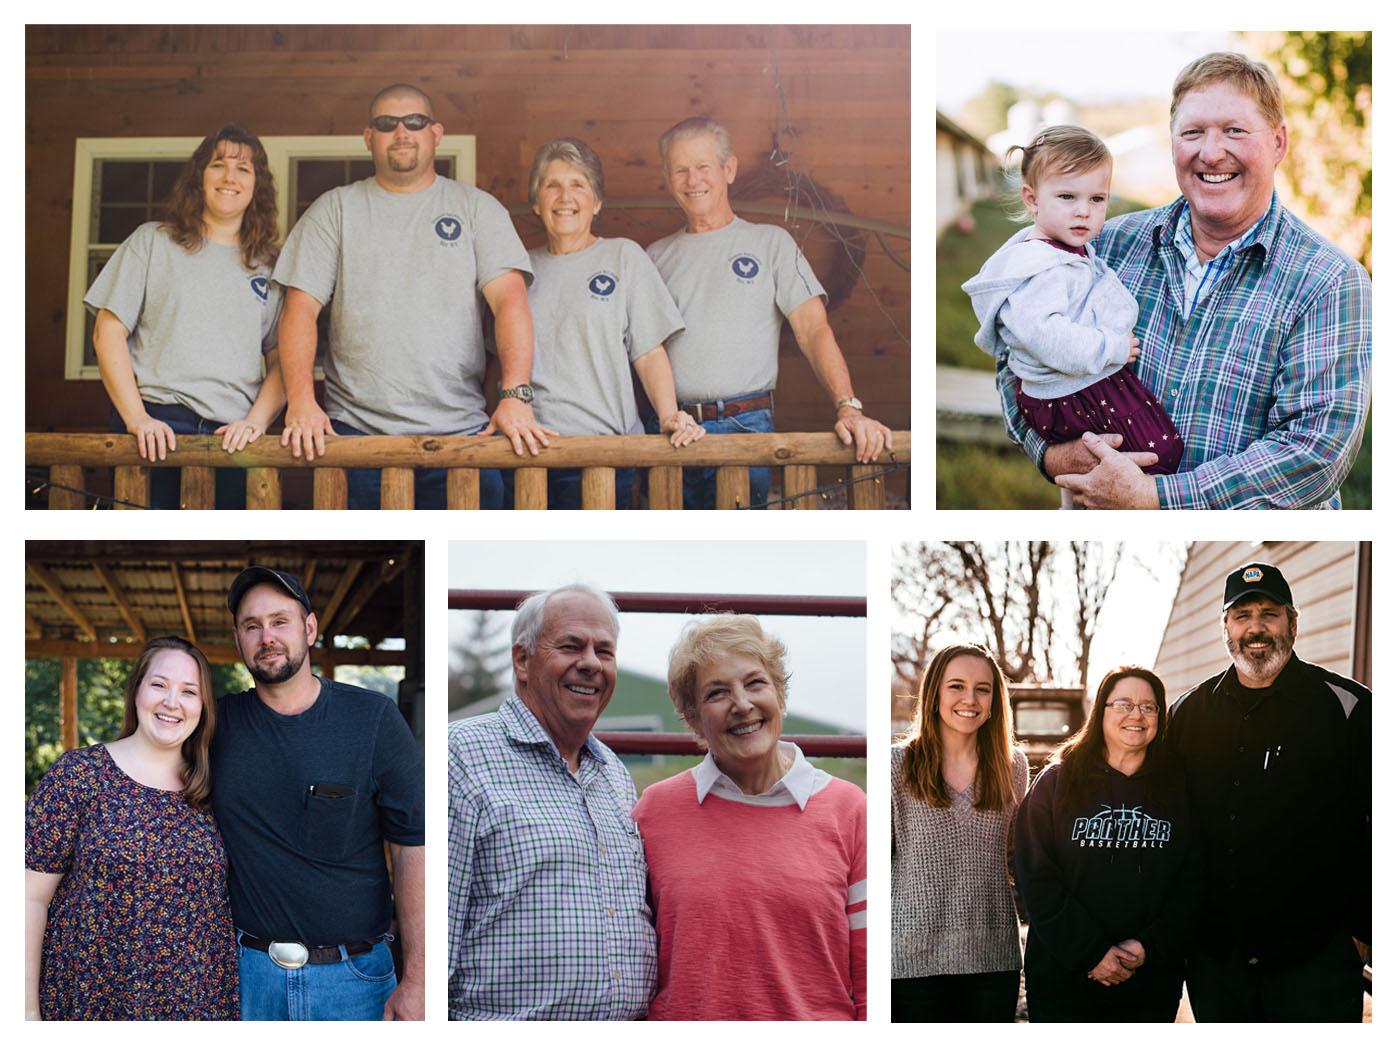 Farmers-restaurant-page.jpg